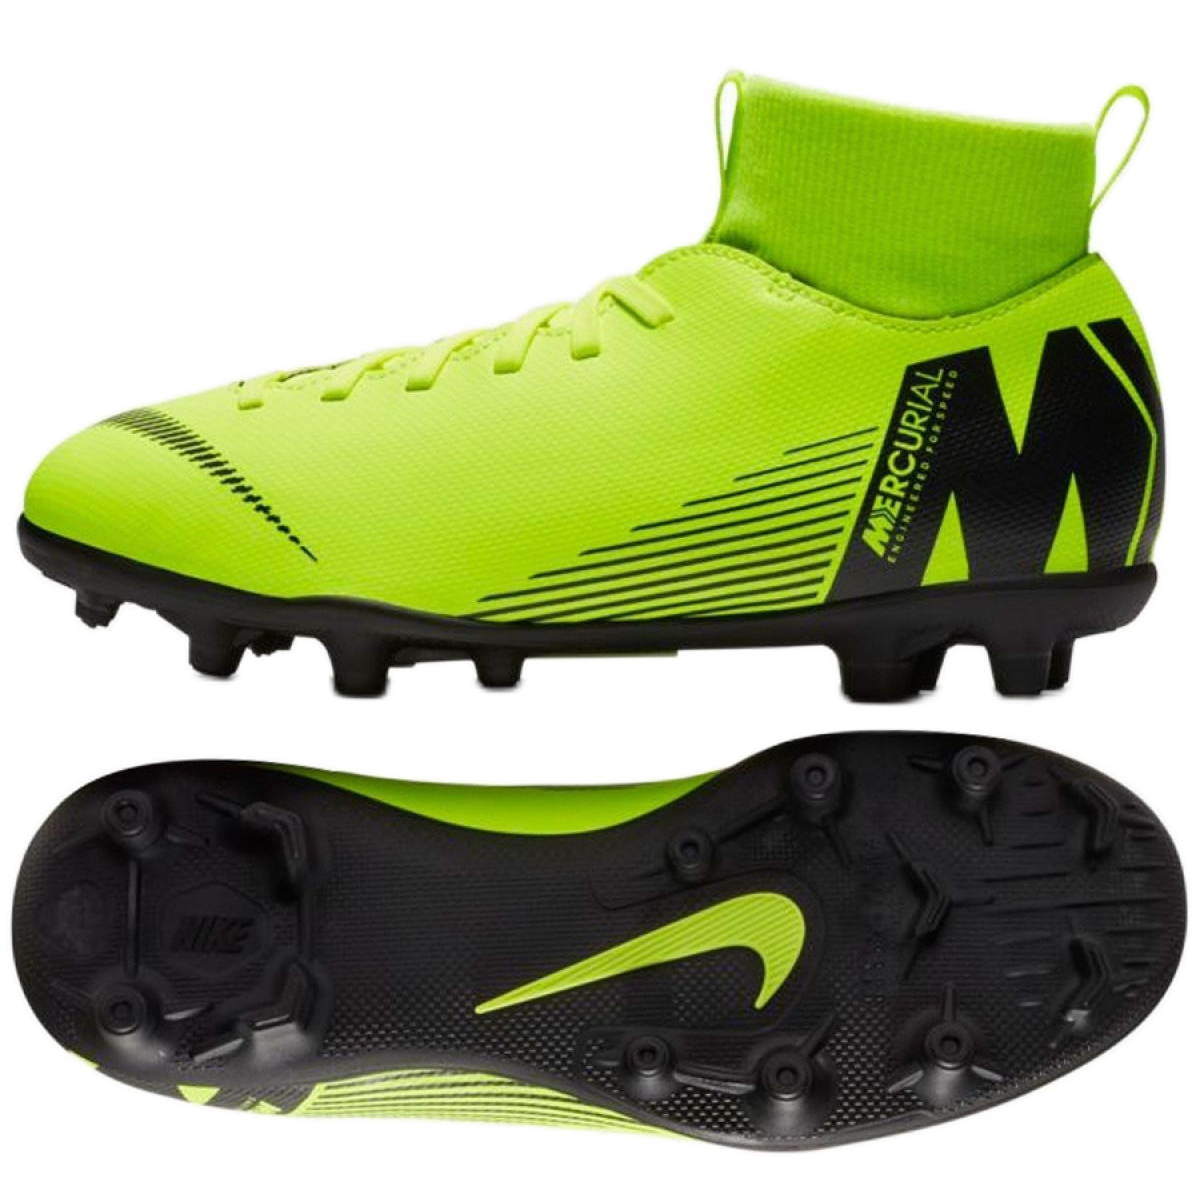 new concept 6be95 d9db6 Football shoes Nike Mercurial Superfly 6 Club Mg Jr AH7339-701